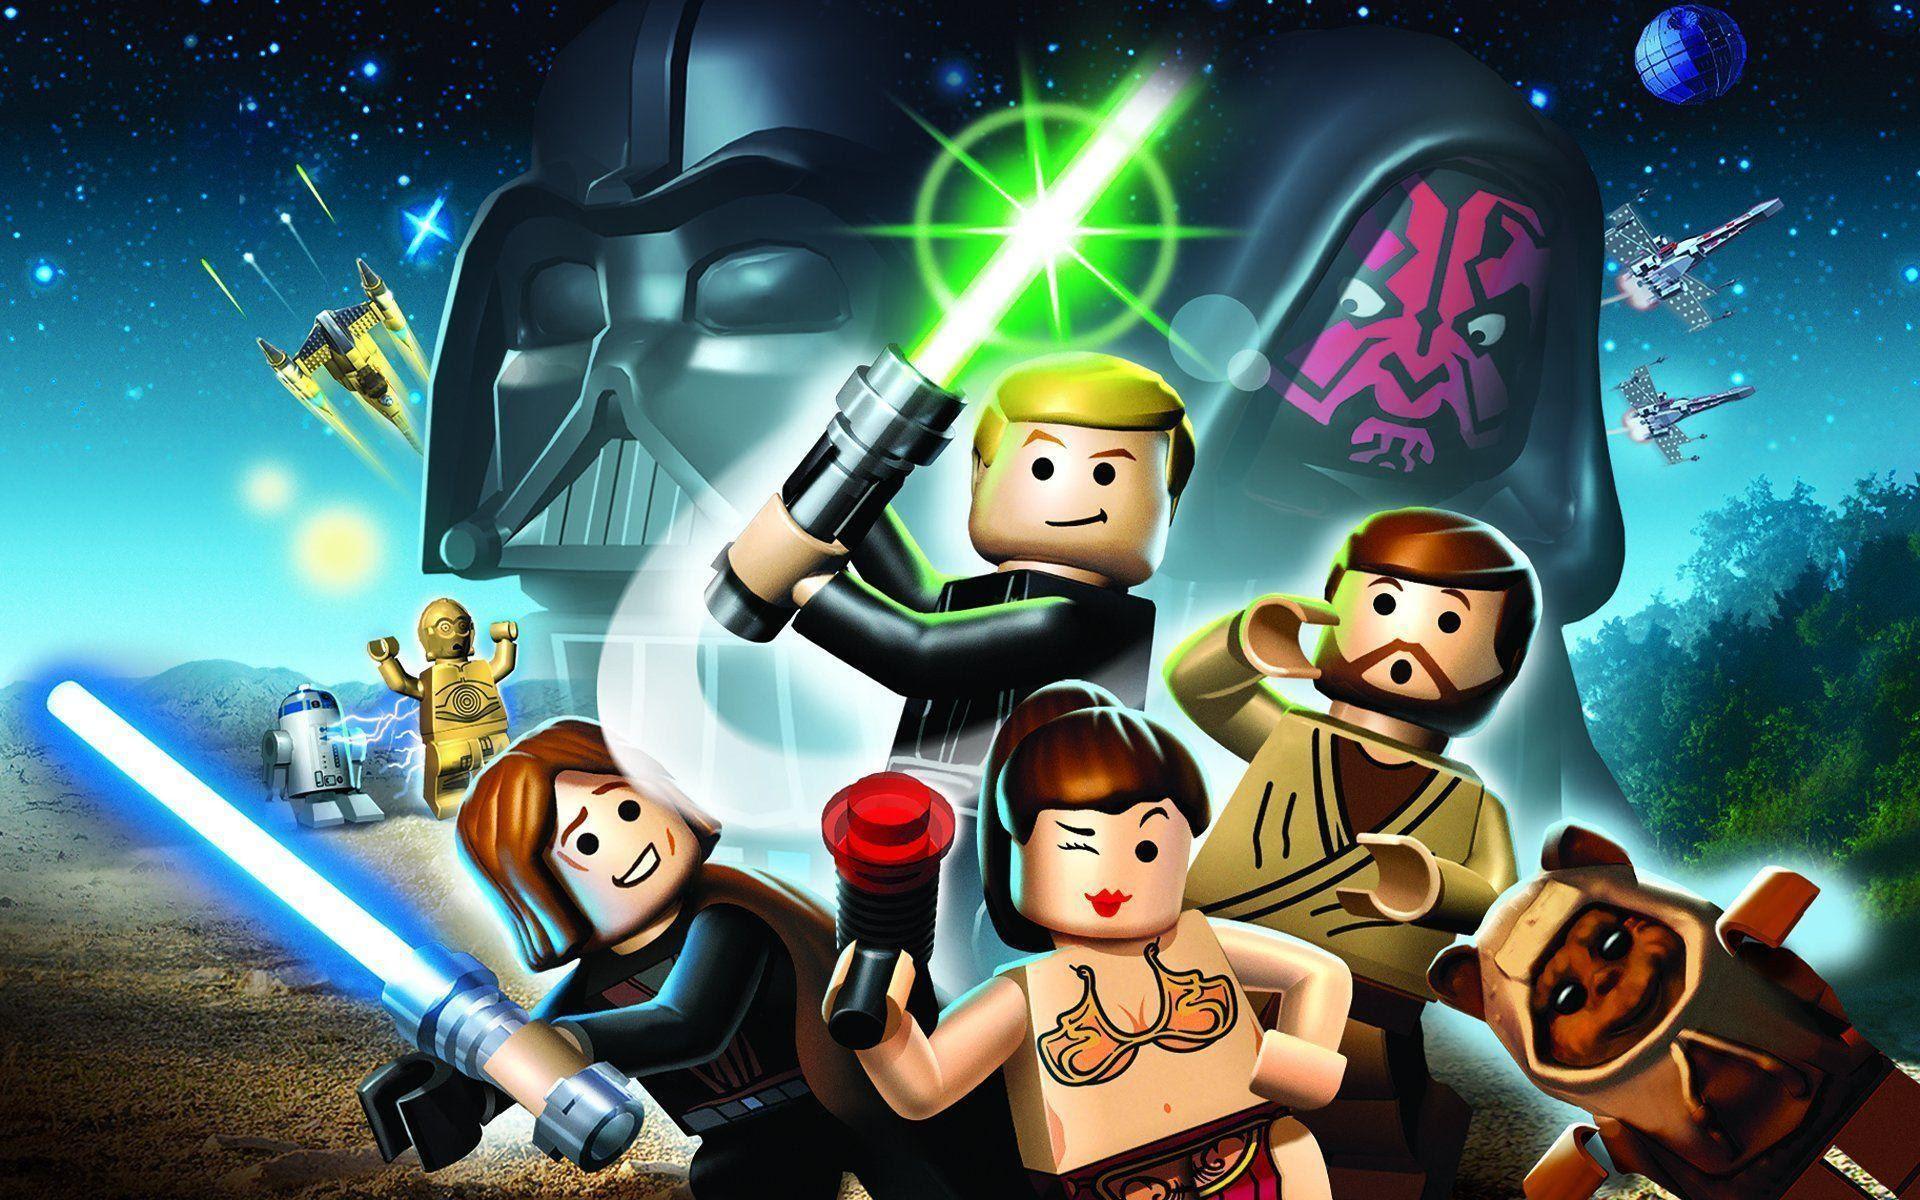 Lego Star Wars Wallpaper 69 Images